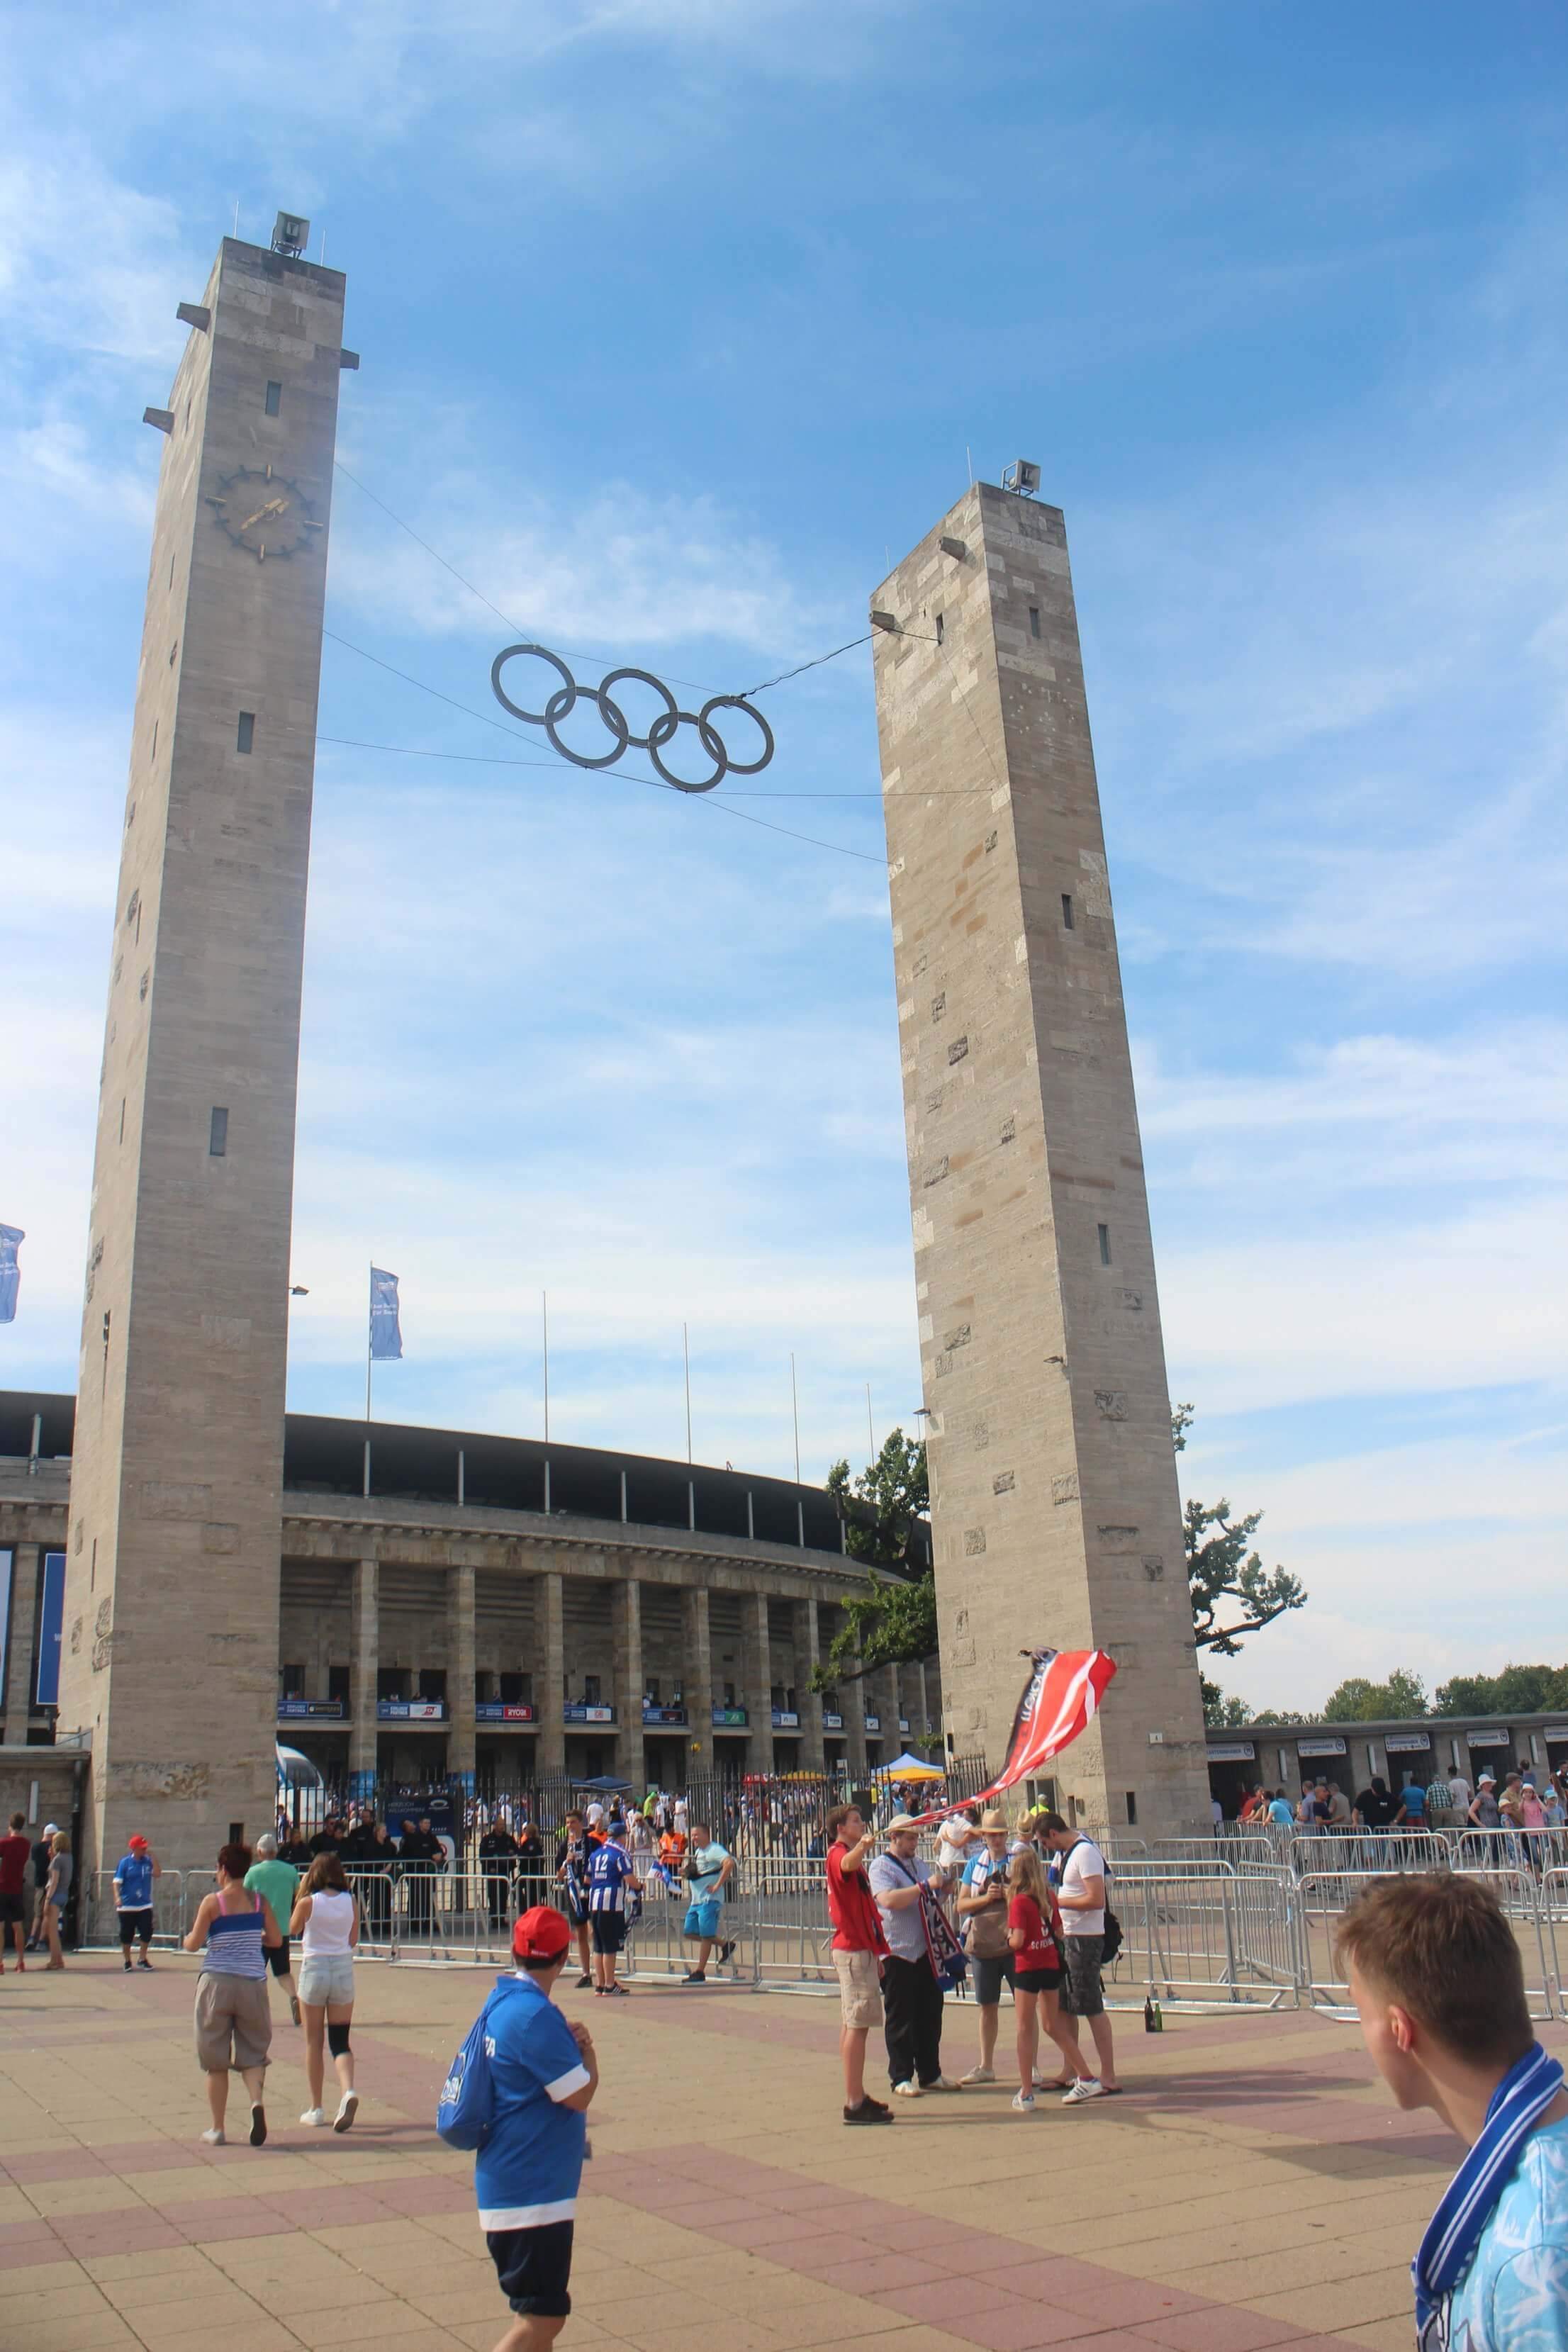 Olympiastadion Berlijn